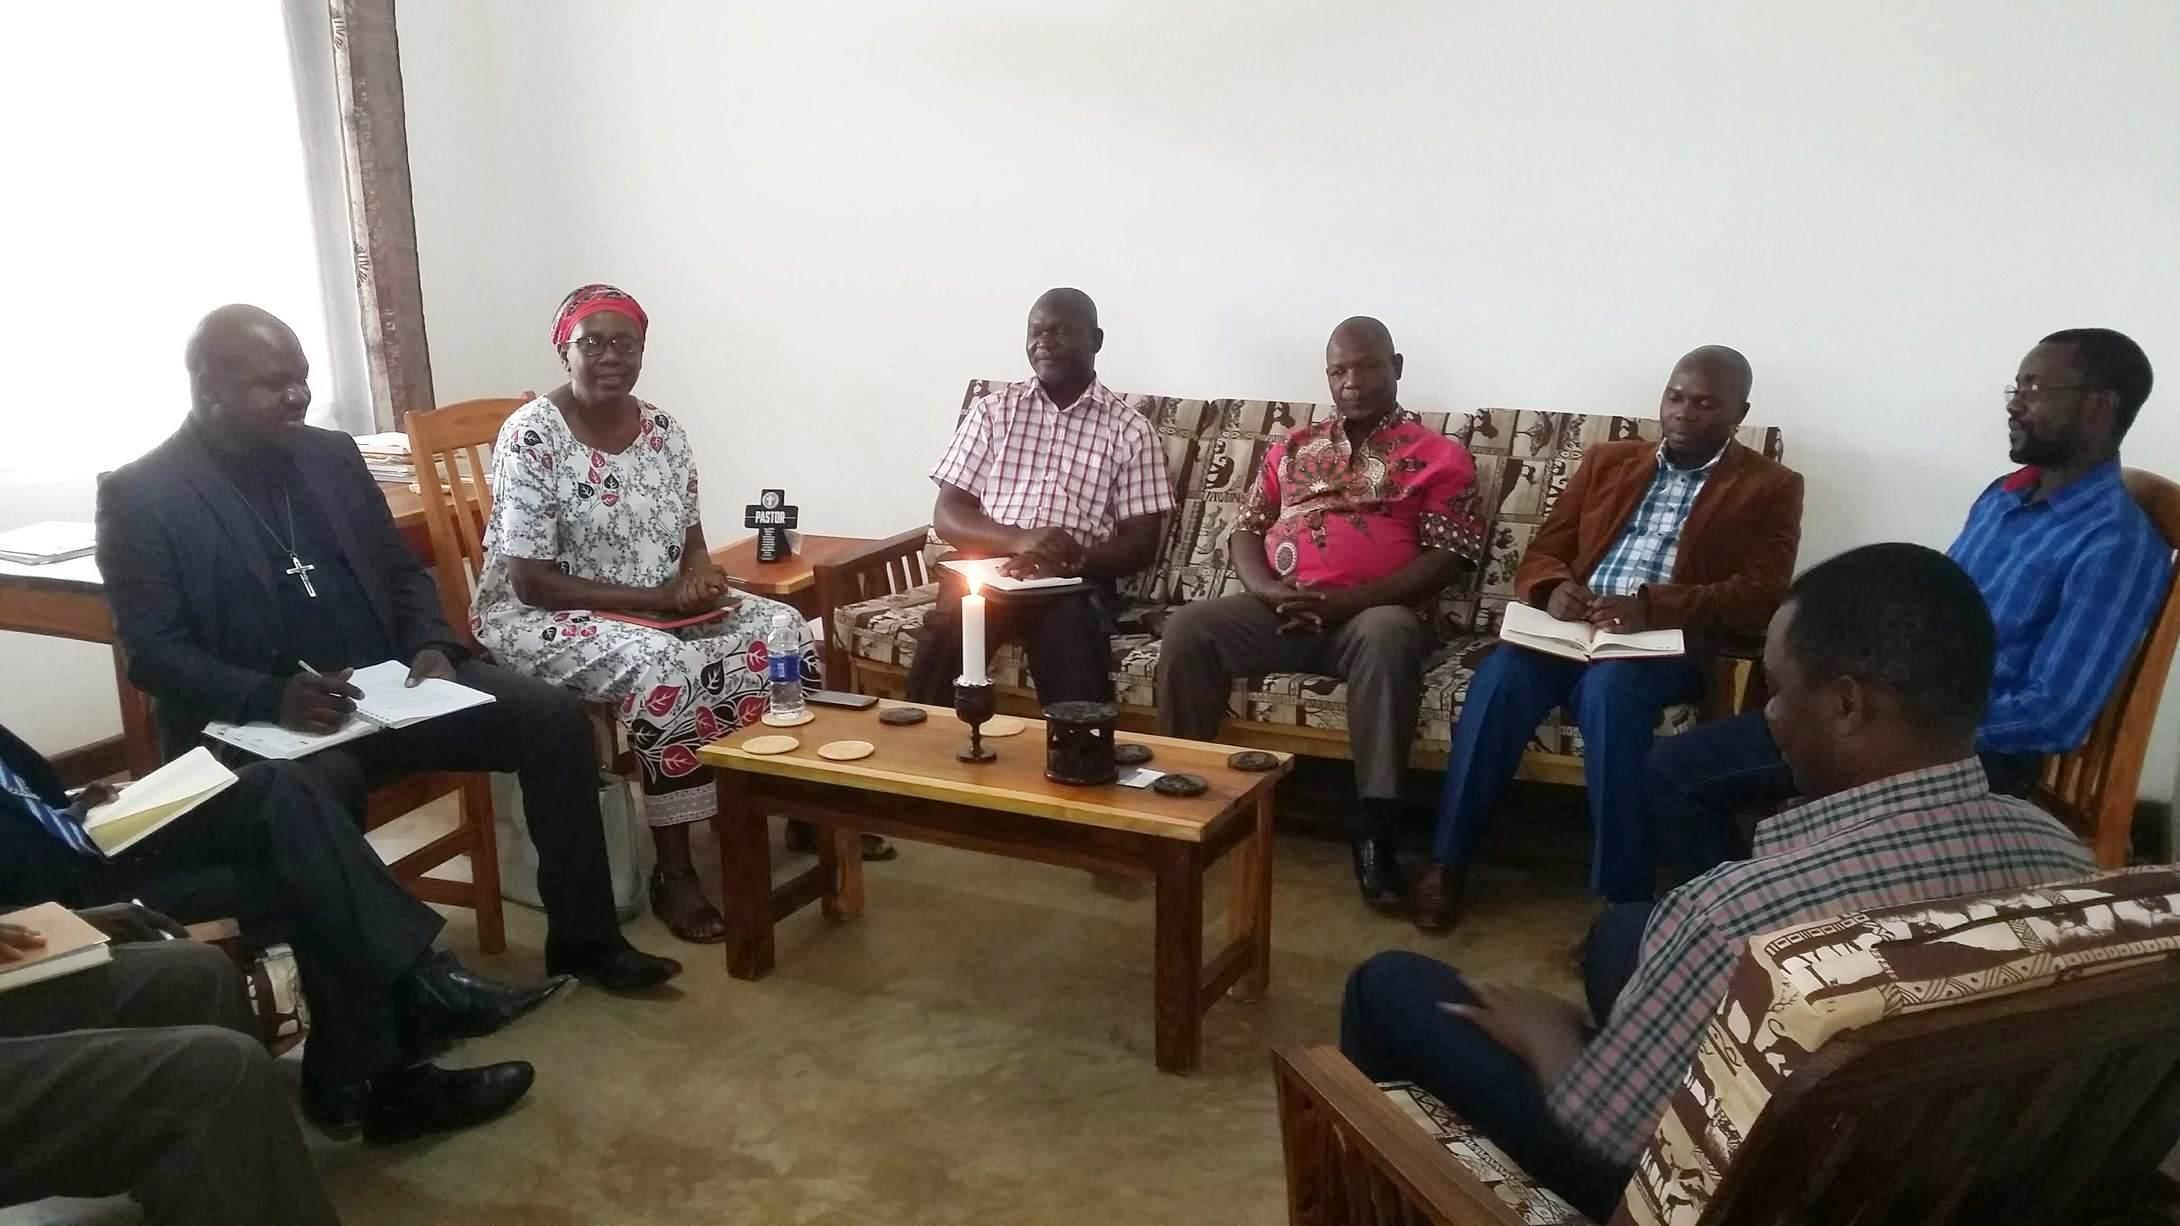 (left to right): Reverends Friday Kapasaka; Jane Nyirongo; Thomson M'Kandawire; Sauros Phaika; Richard M'Kandawire; Kennedy Mhoni; and Edward Chirwa.